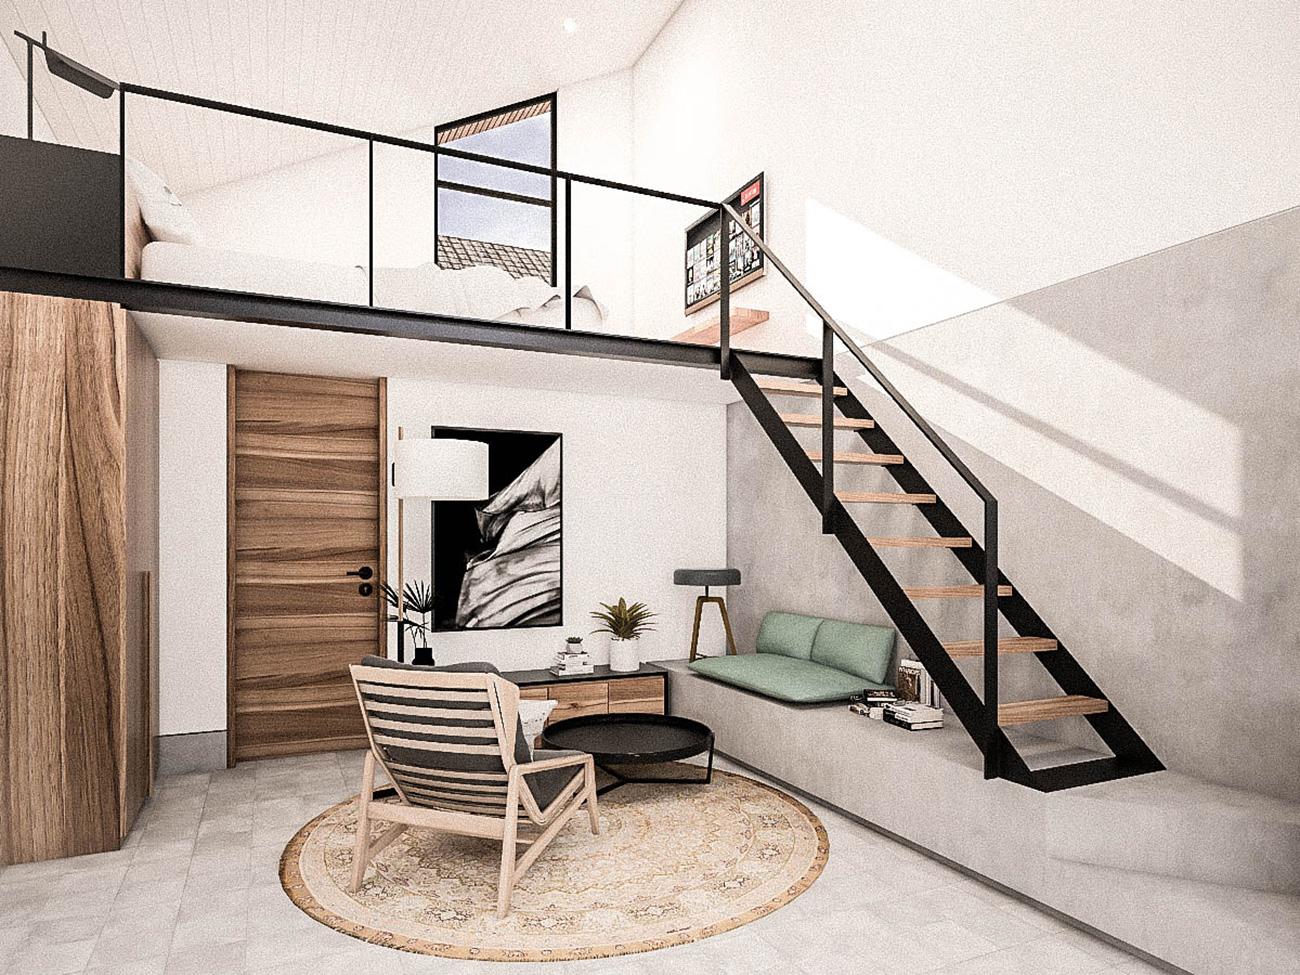 House-B-interior-2